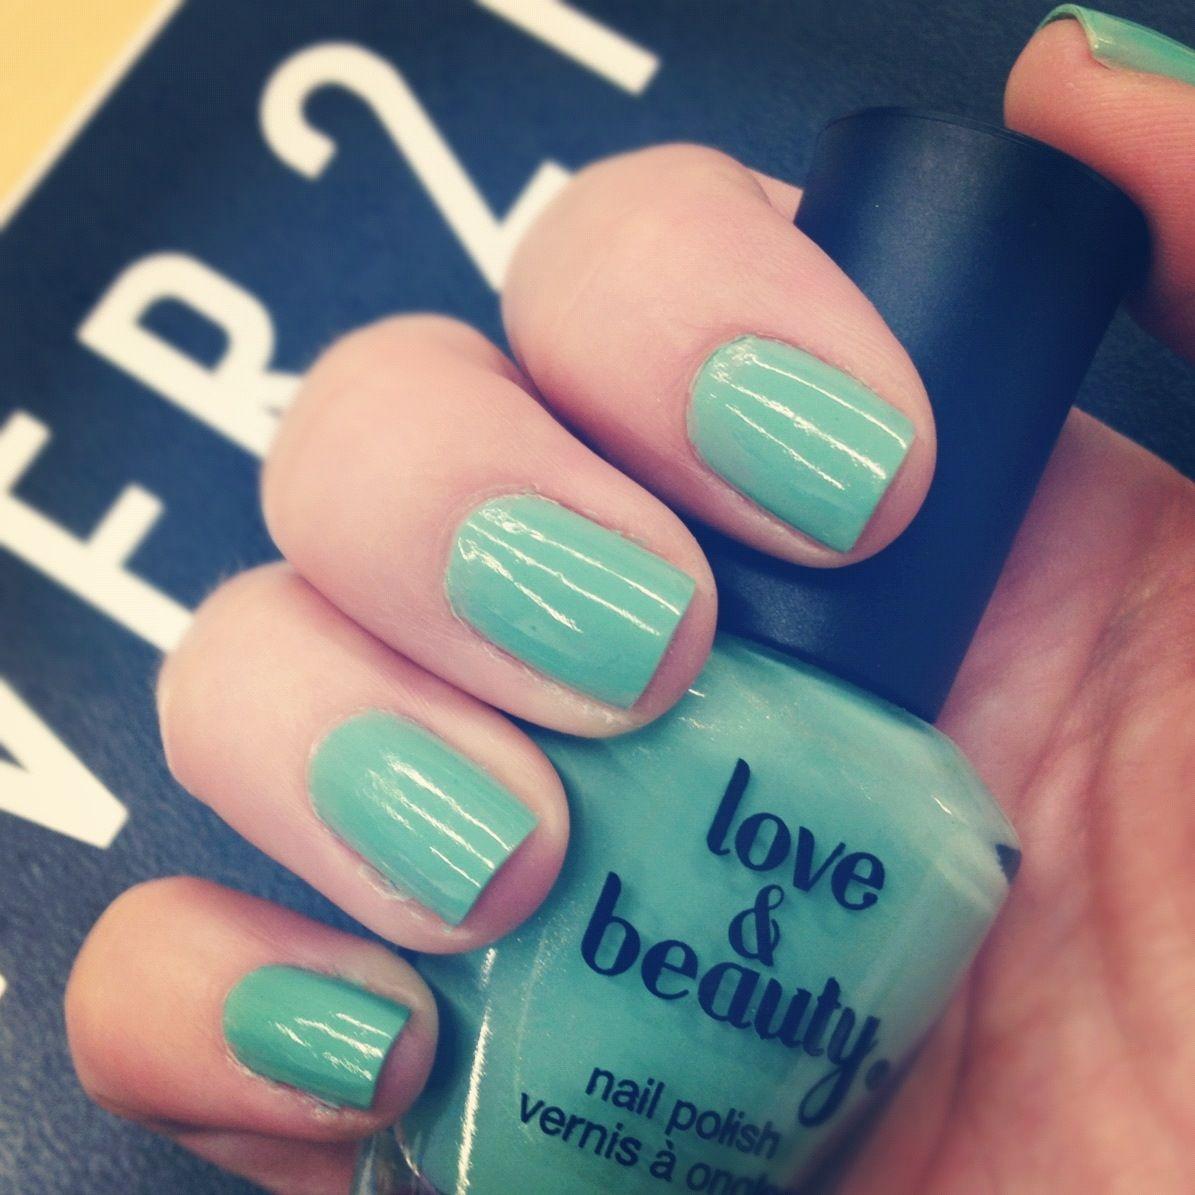 #avocado nails by Love & Beauty $2.80! Shop nail polish here: http://bit.ly/A0uoM9